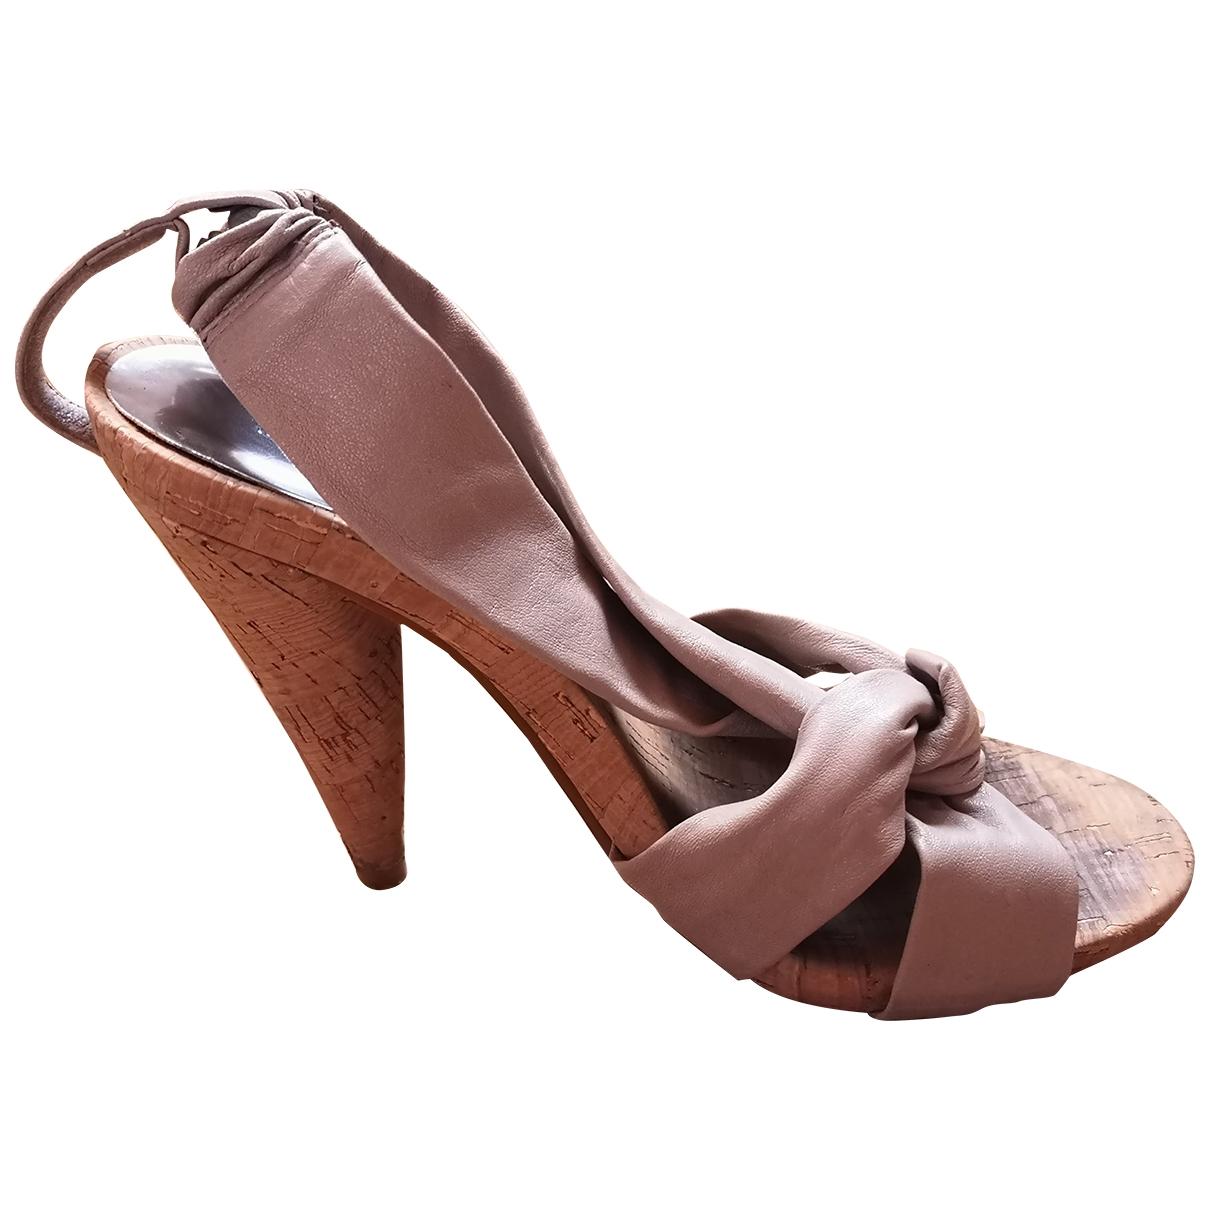 Michael Kors \N Beige Leather Heels for Women 37.5 EU